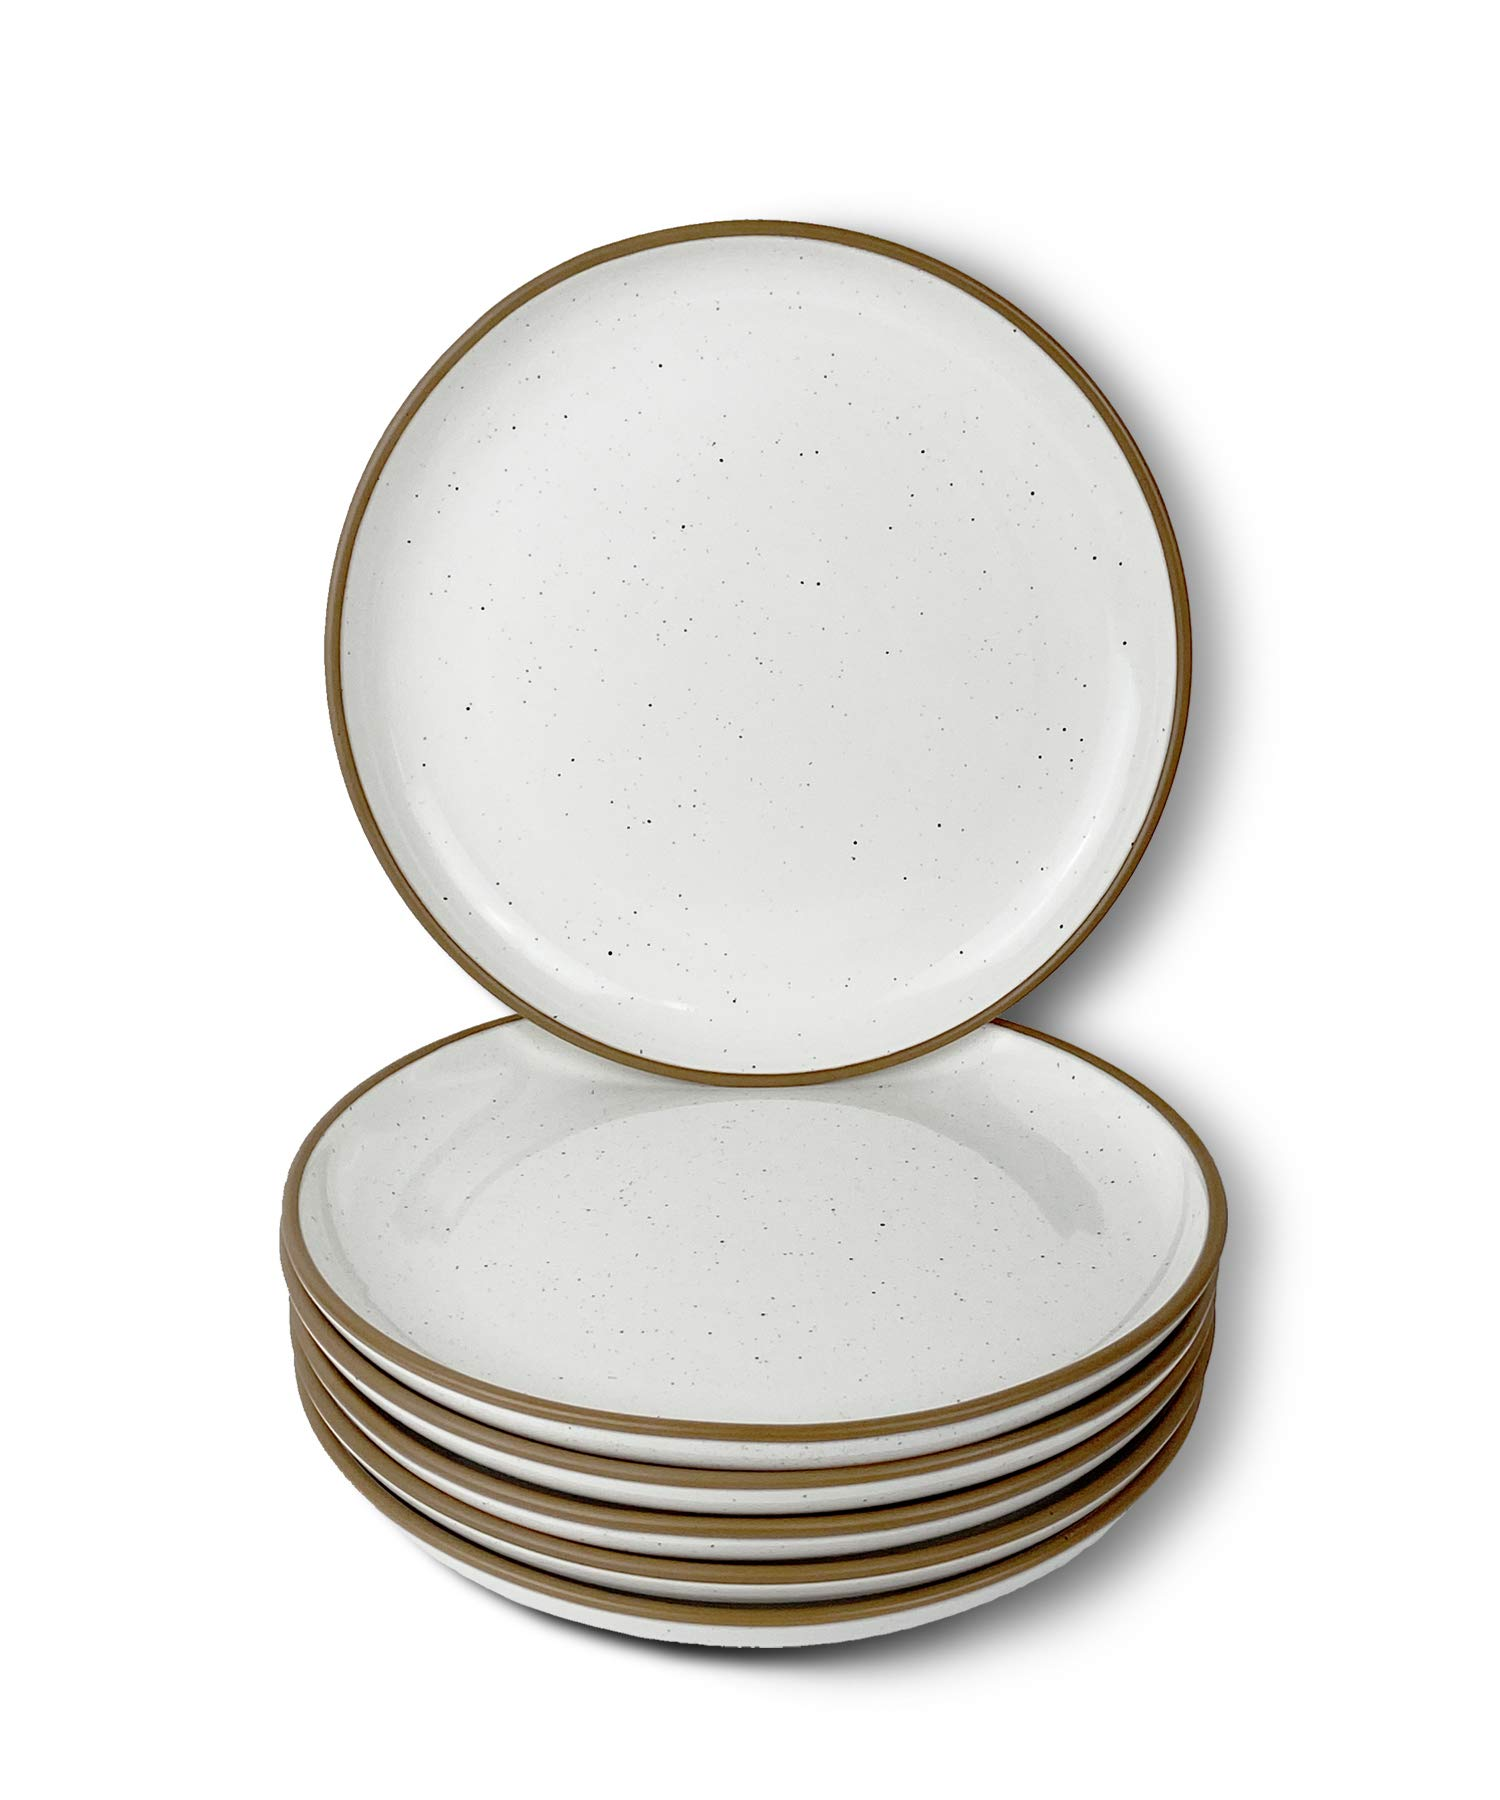 Amazon Com Mora Ceramic Plates Set 7 8 In Set Of 6 The Dessert Salad Appetizer Small Dinner Etc Plate Microwave Oven And Dishwasher Safe Scratch Resistant Kitchen Porcelain Dish Vanilla White Dinner Plates